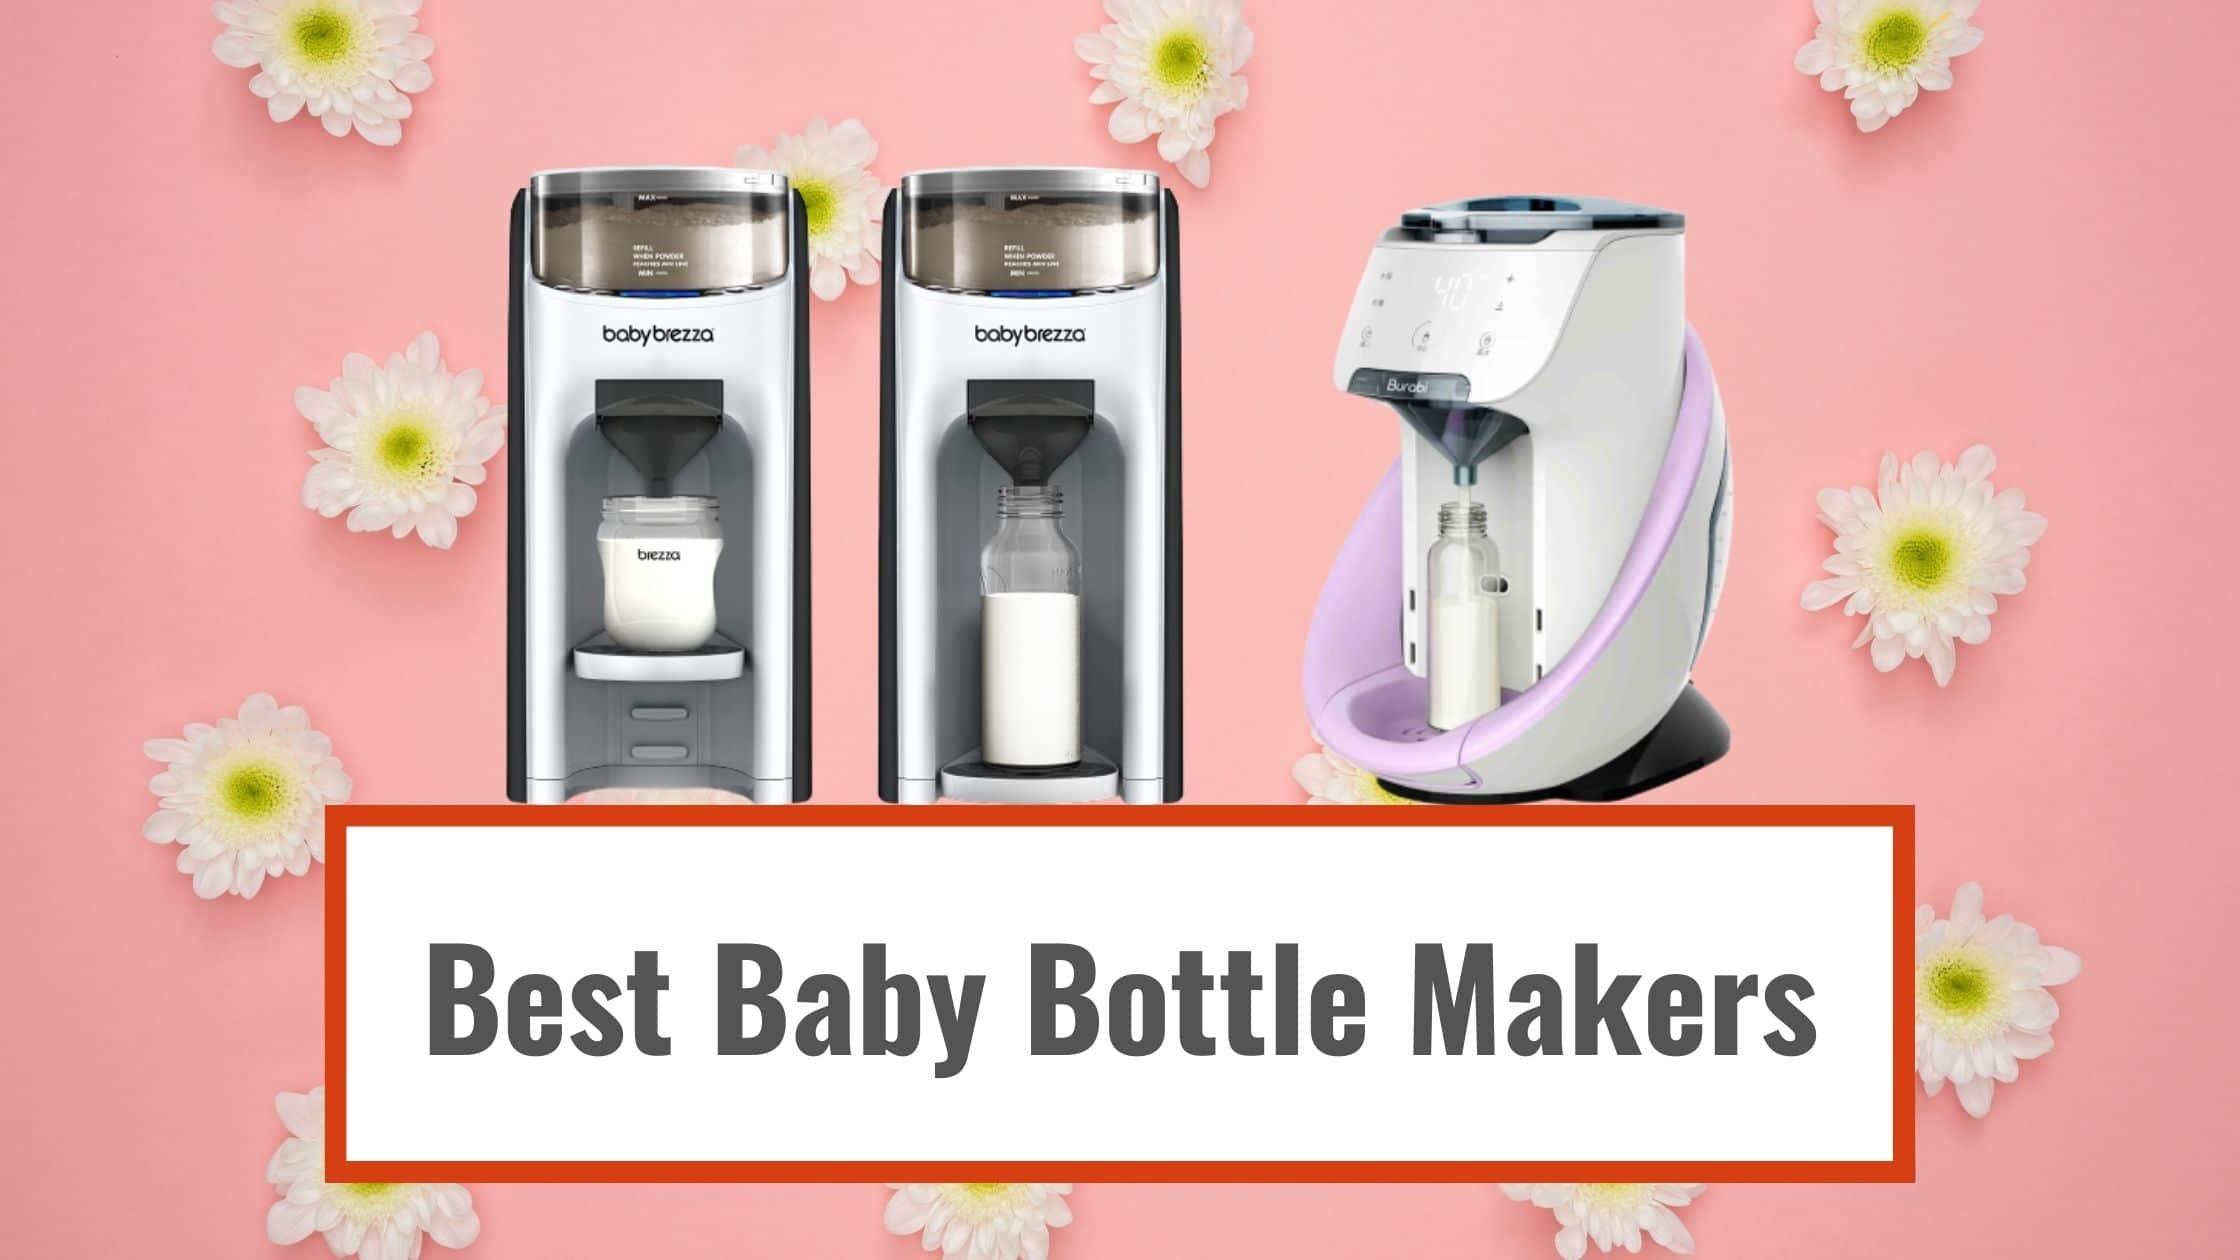 Best Baby Bottle Makers